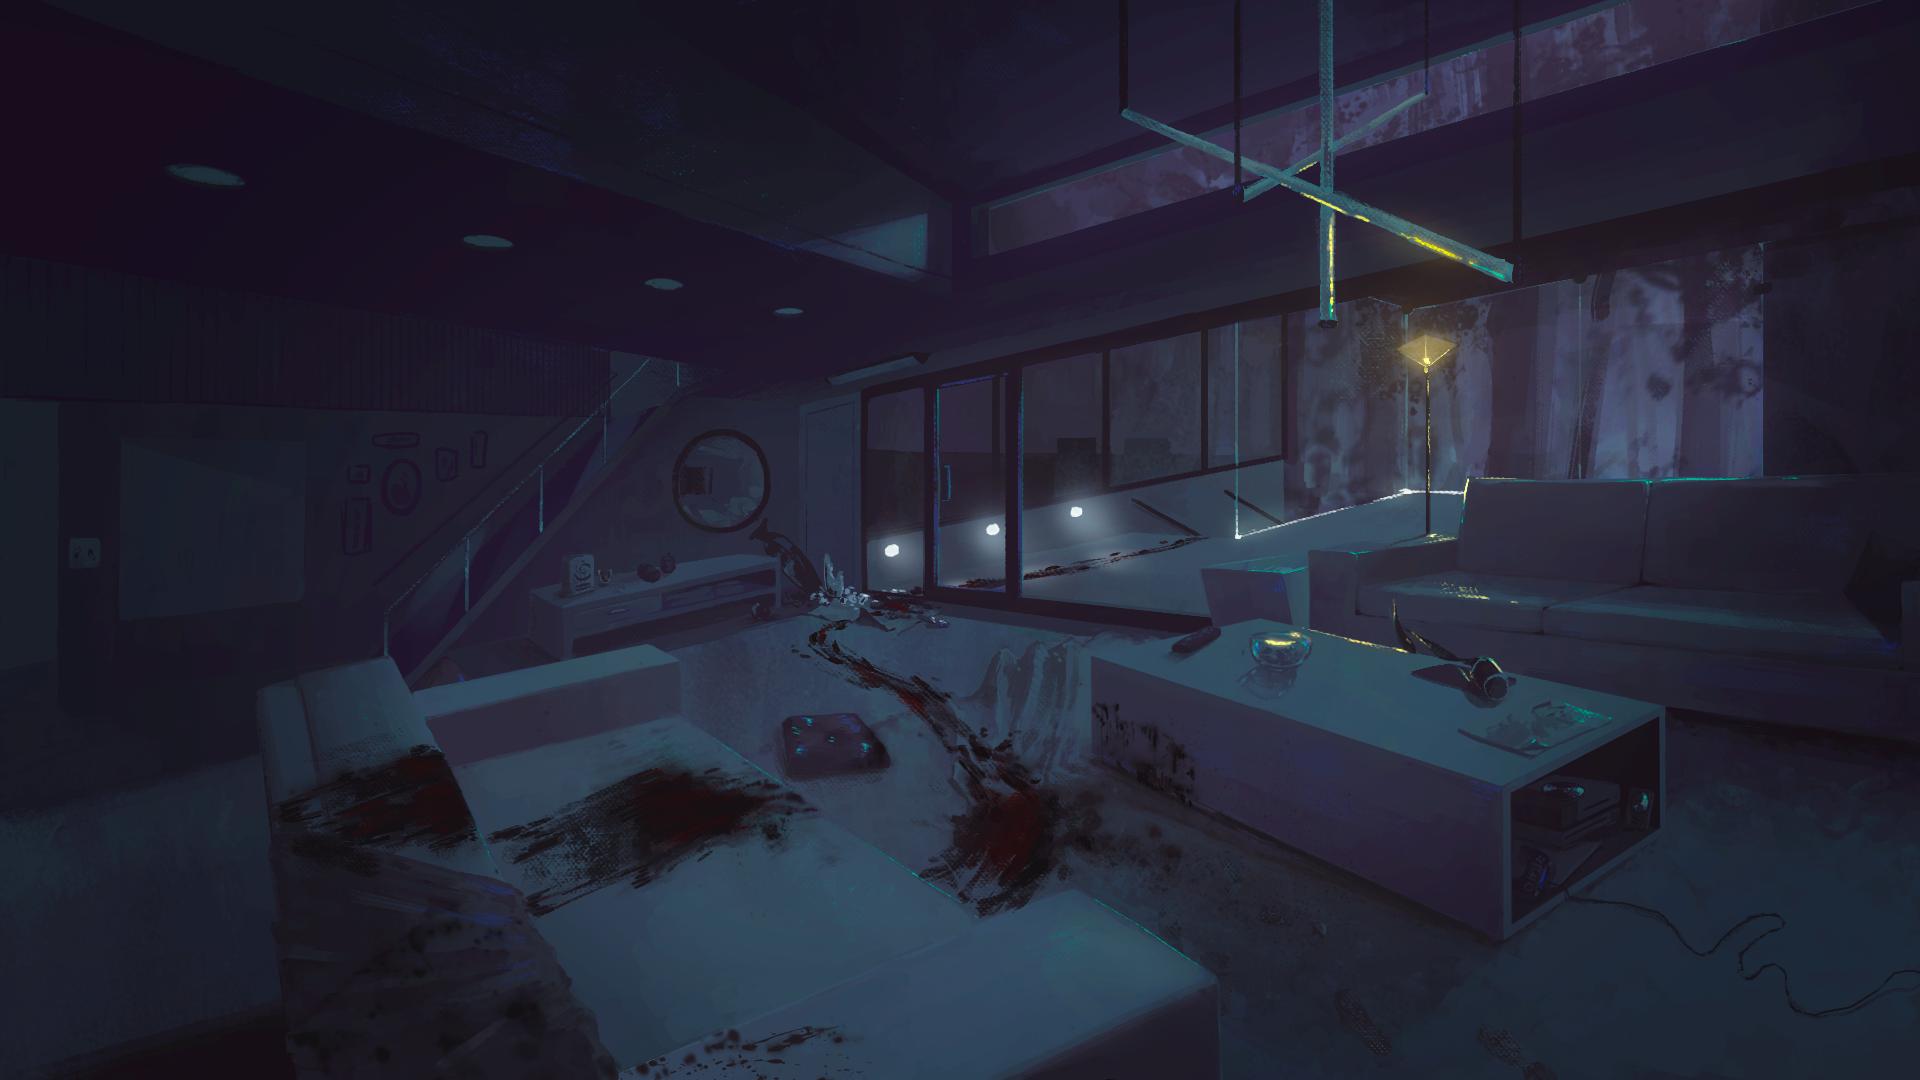 Grover Interior 02 | B. Chau